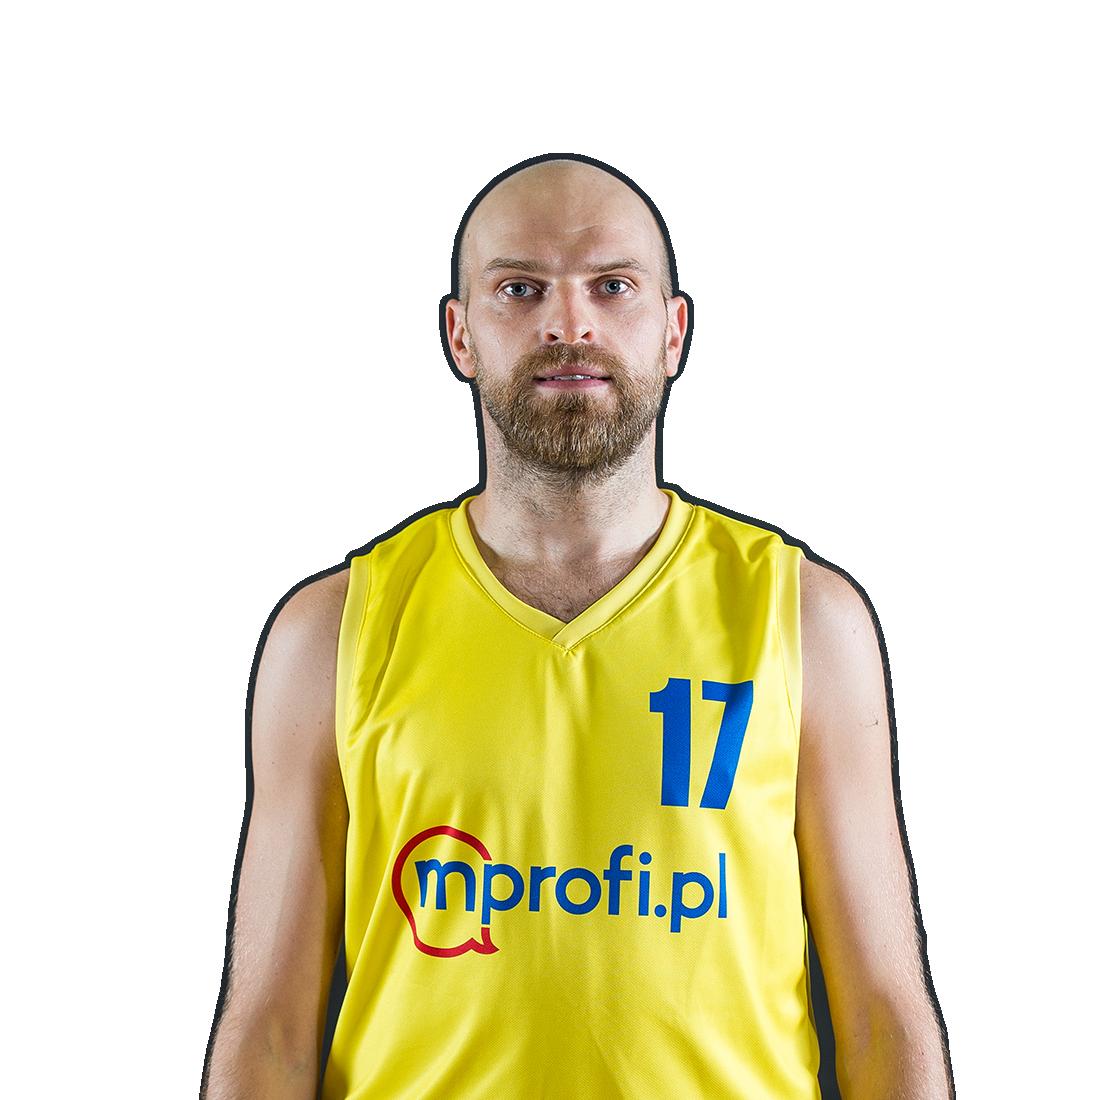 Paweł Tarnowski